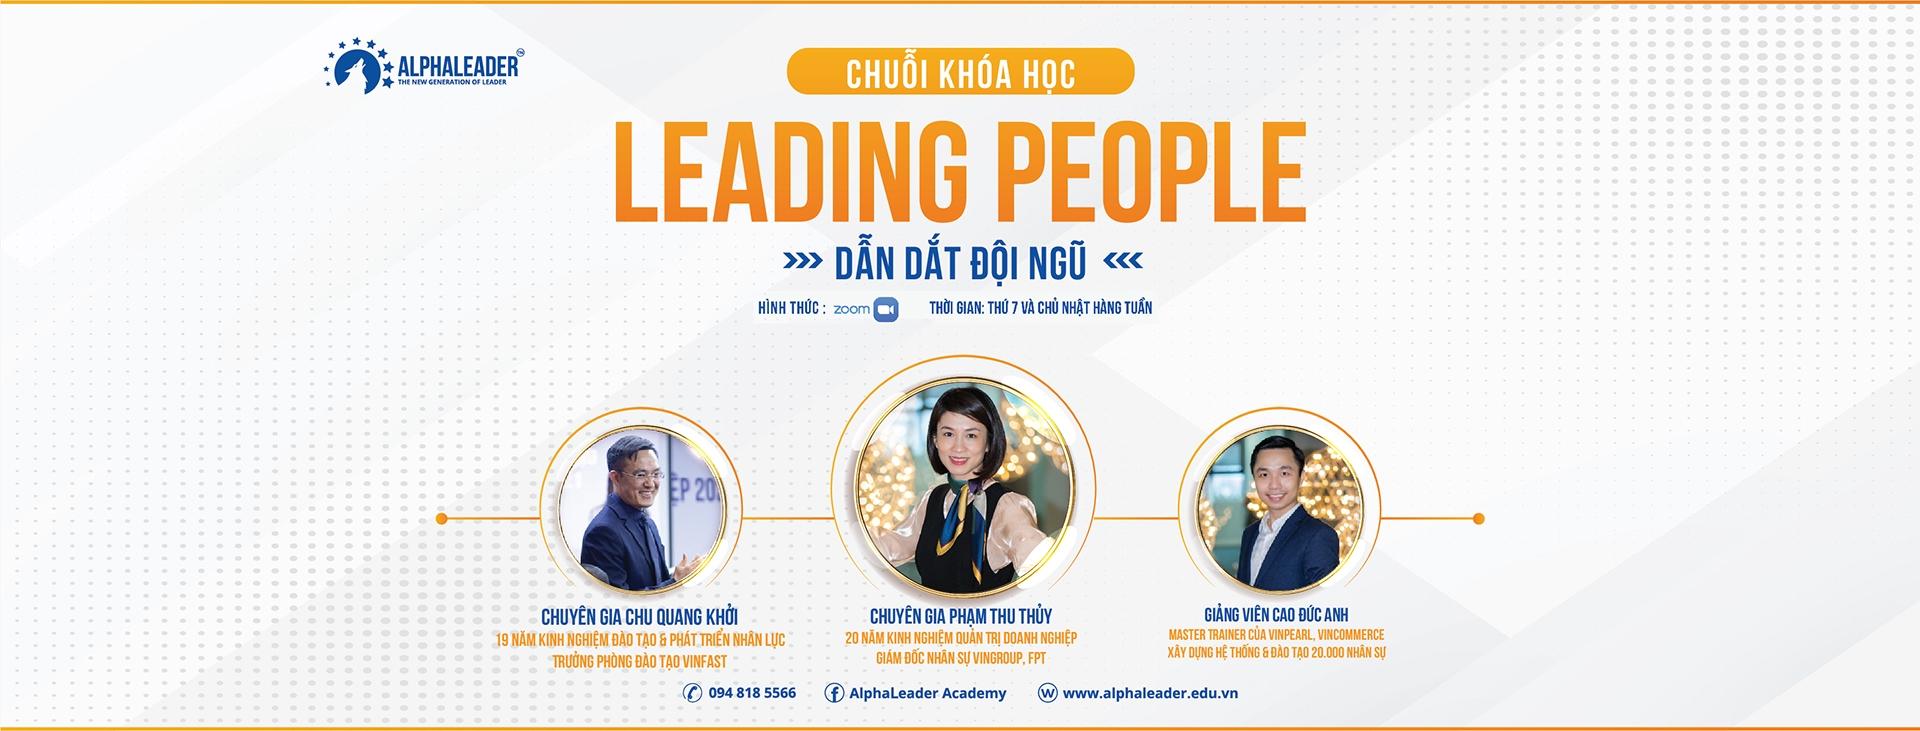 Chuoi Online Leading People